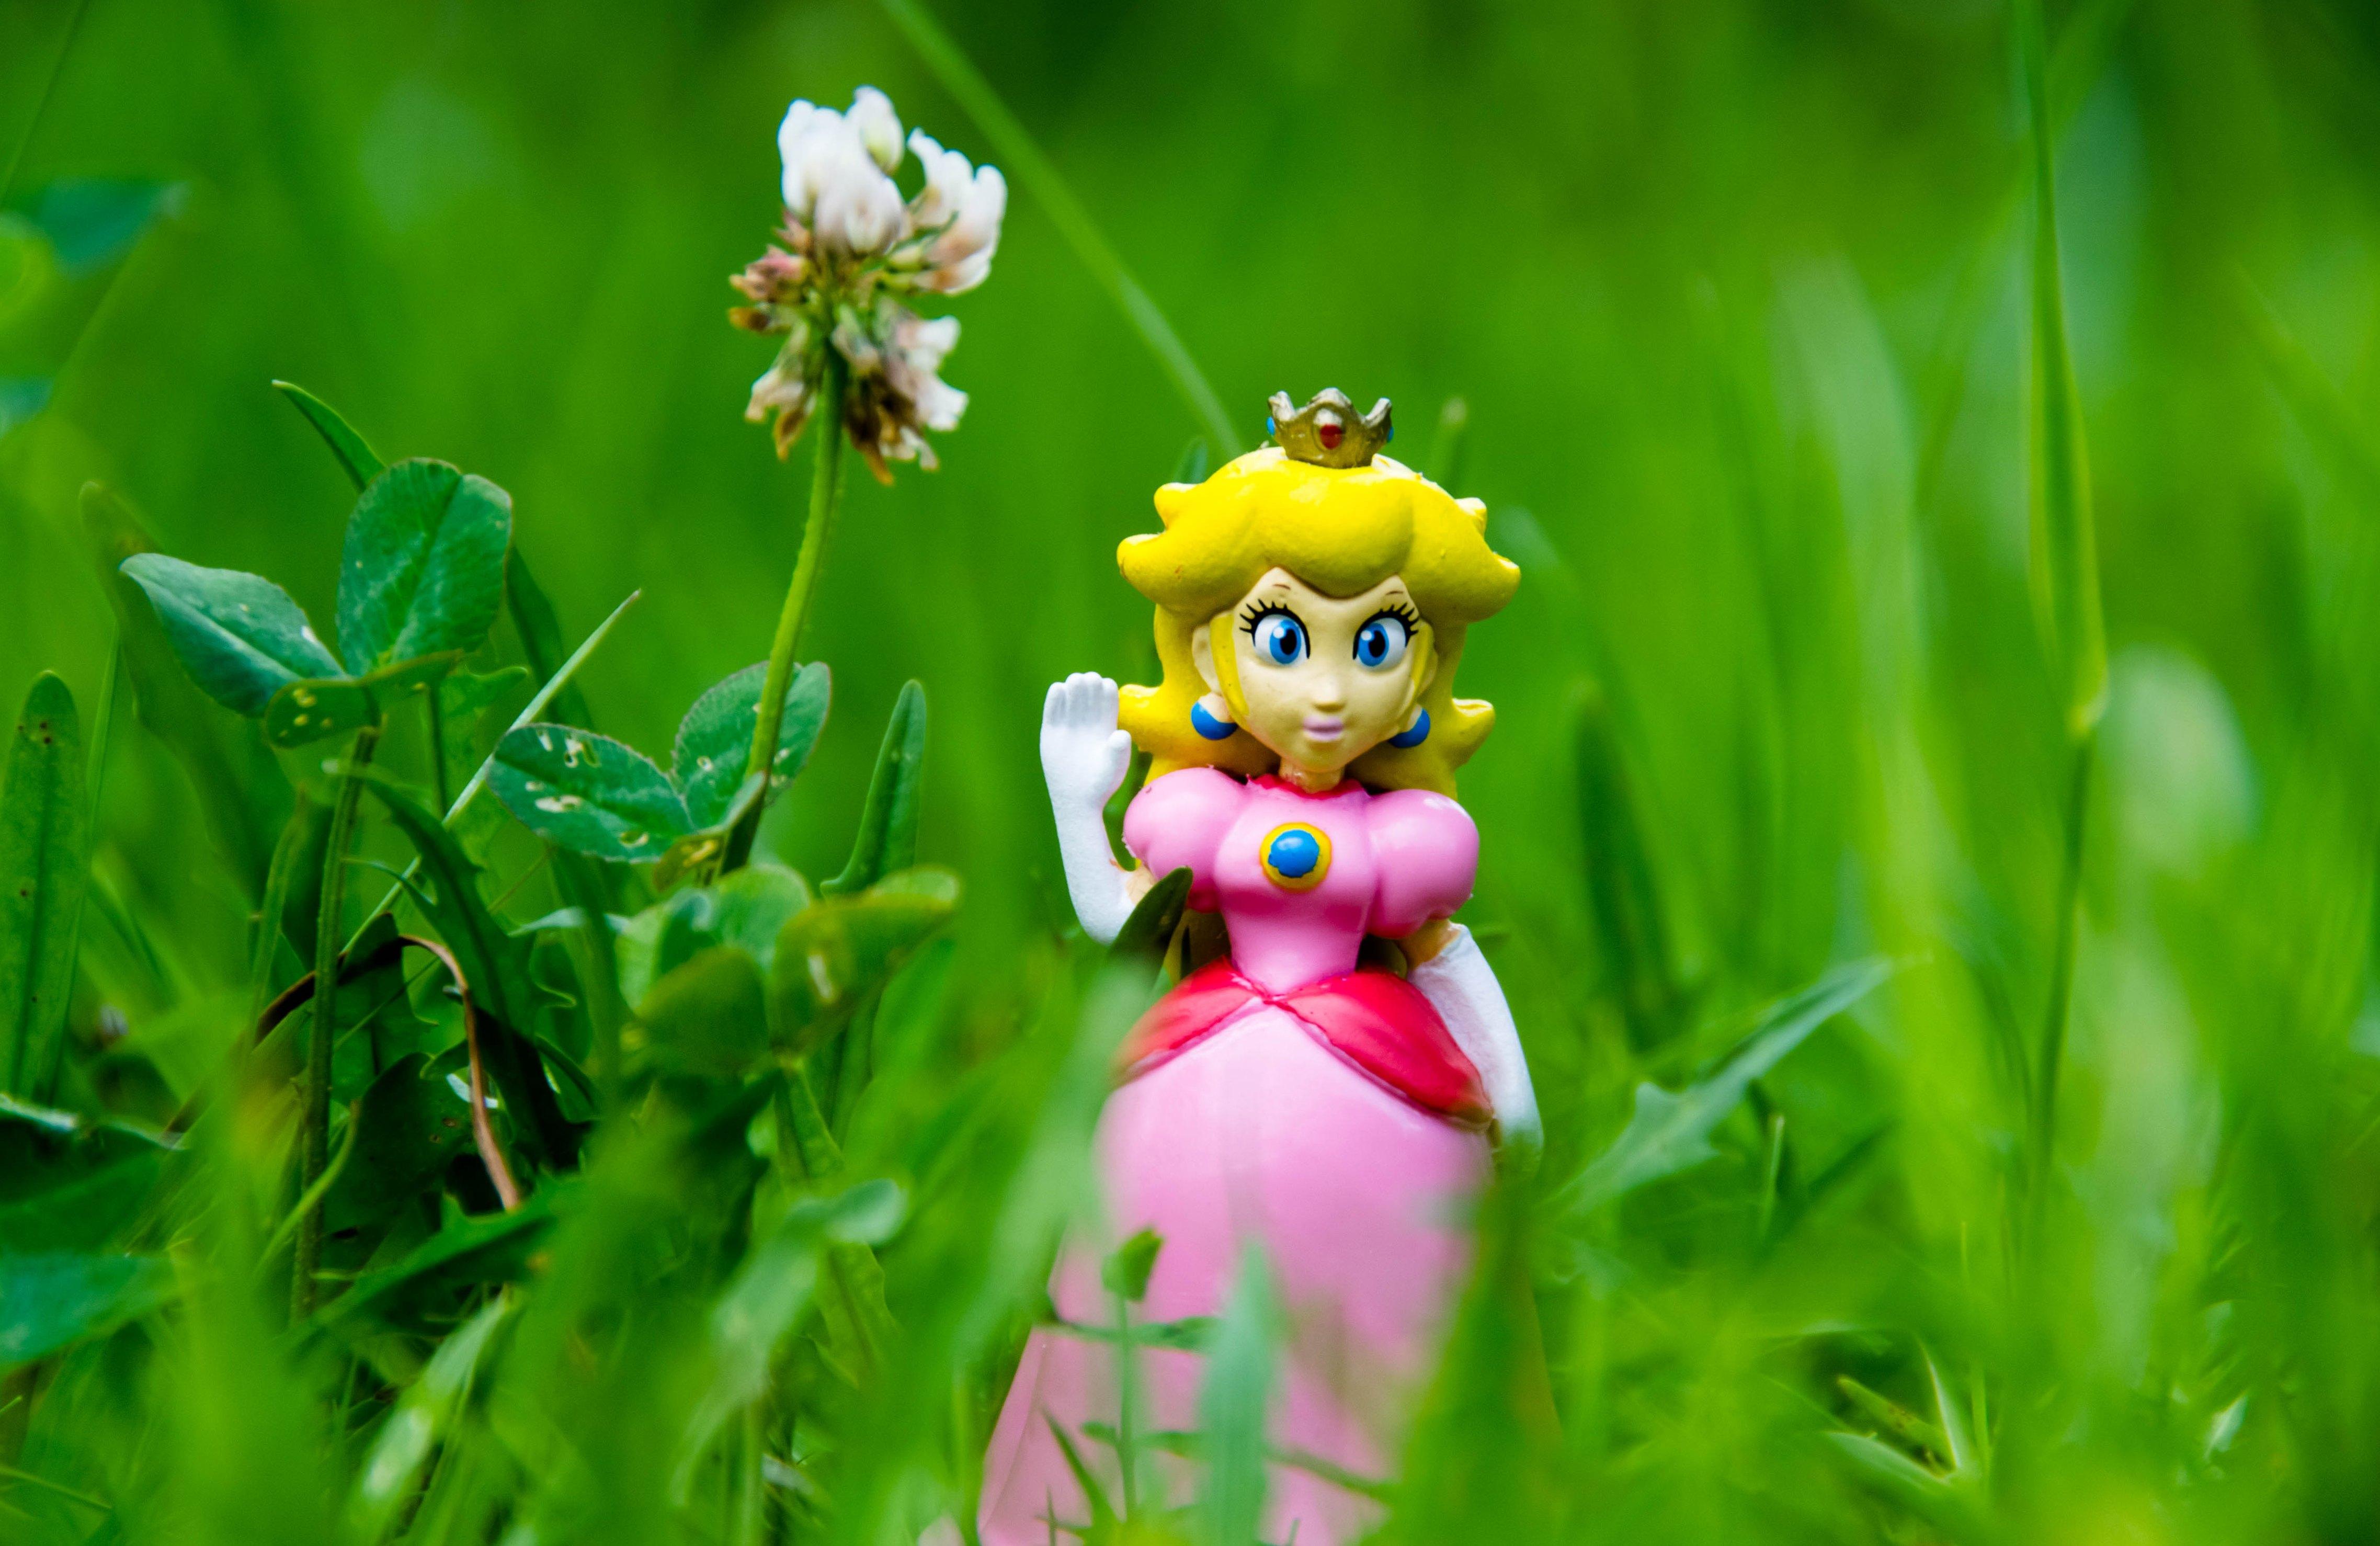 Princess Peach by JellyBellyNyan